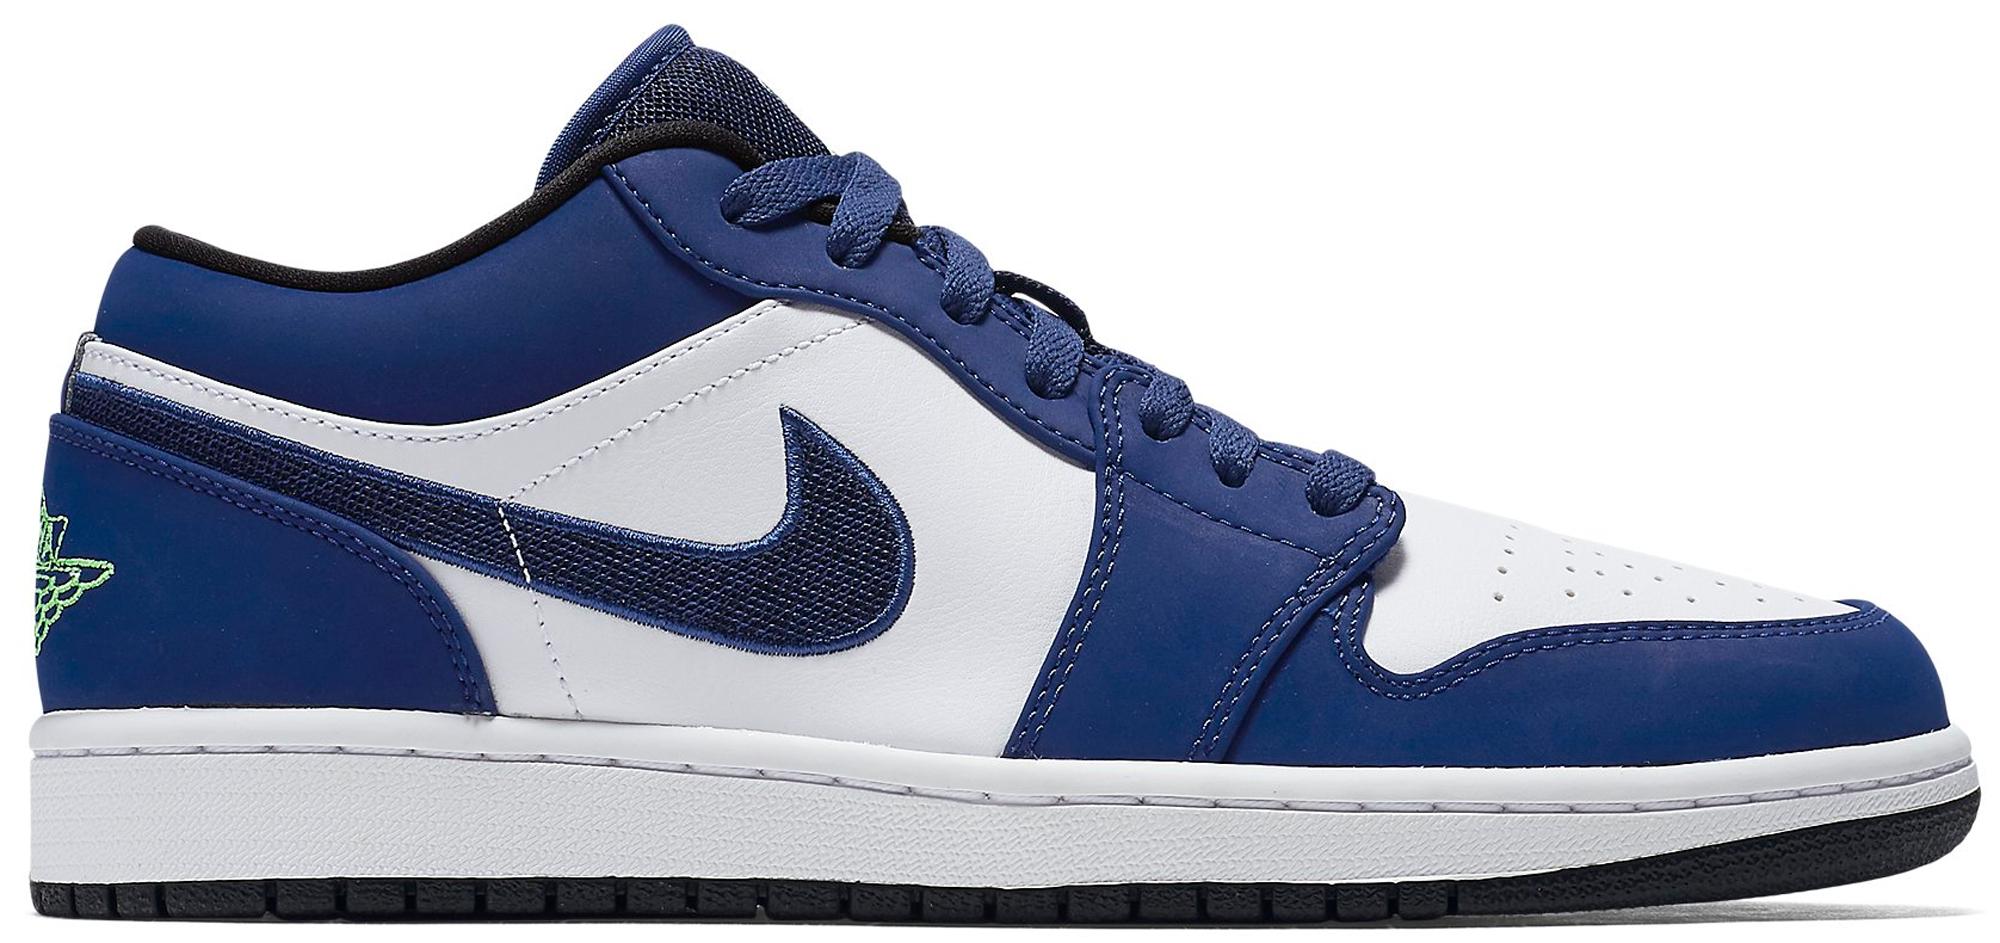 Jordan 1 Low Insignia Blue - 553558-405